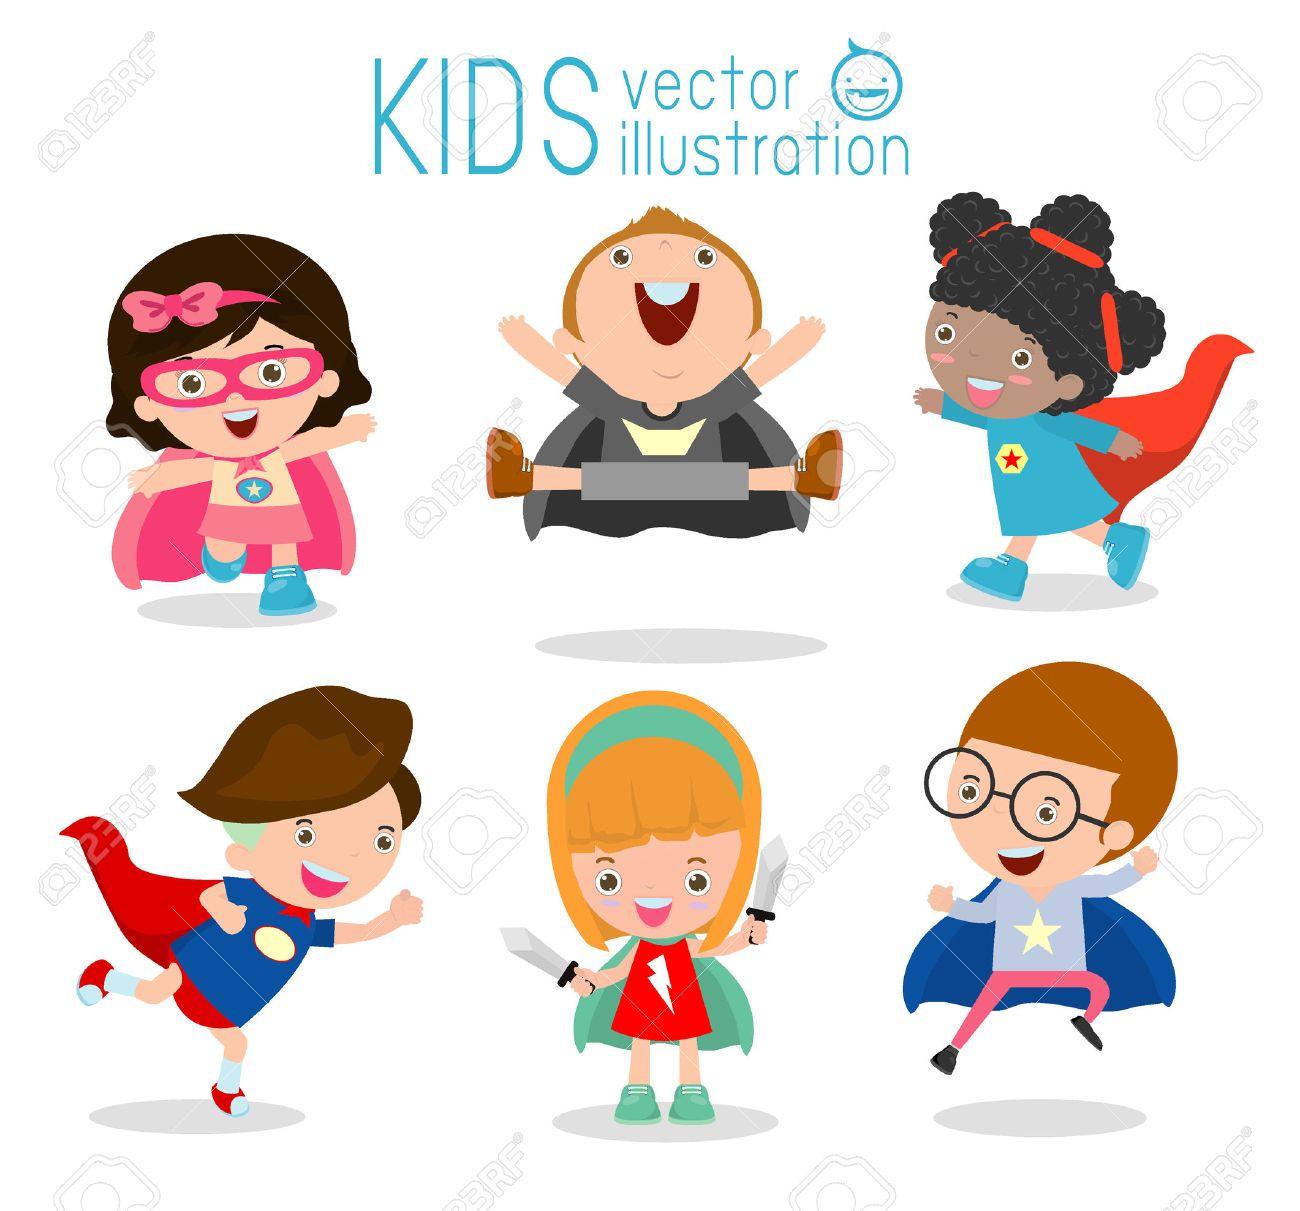 Superhero Children's, Superhero Kids,Kids With Superhero Costumes set, kids in Superhero costume characters isolated on white background, Cute little Superhero, Children's collection - 52524093